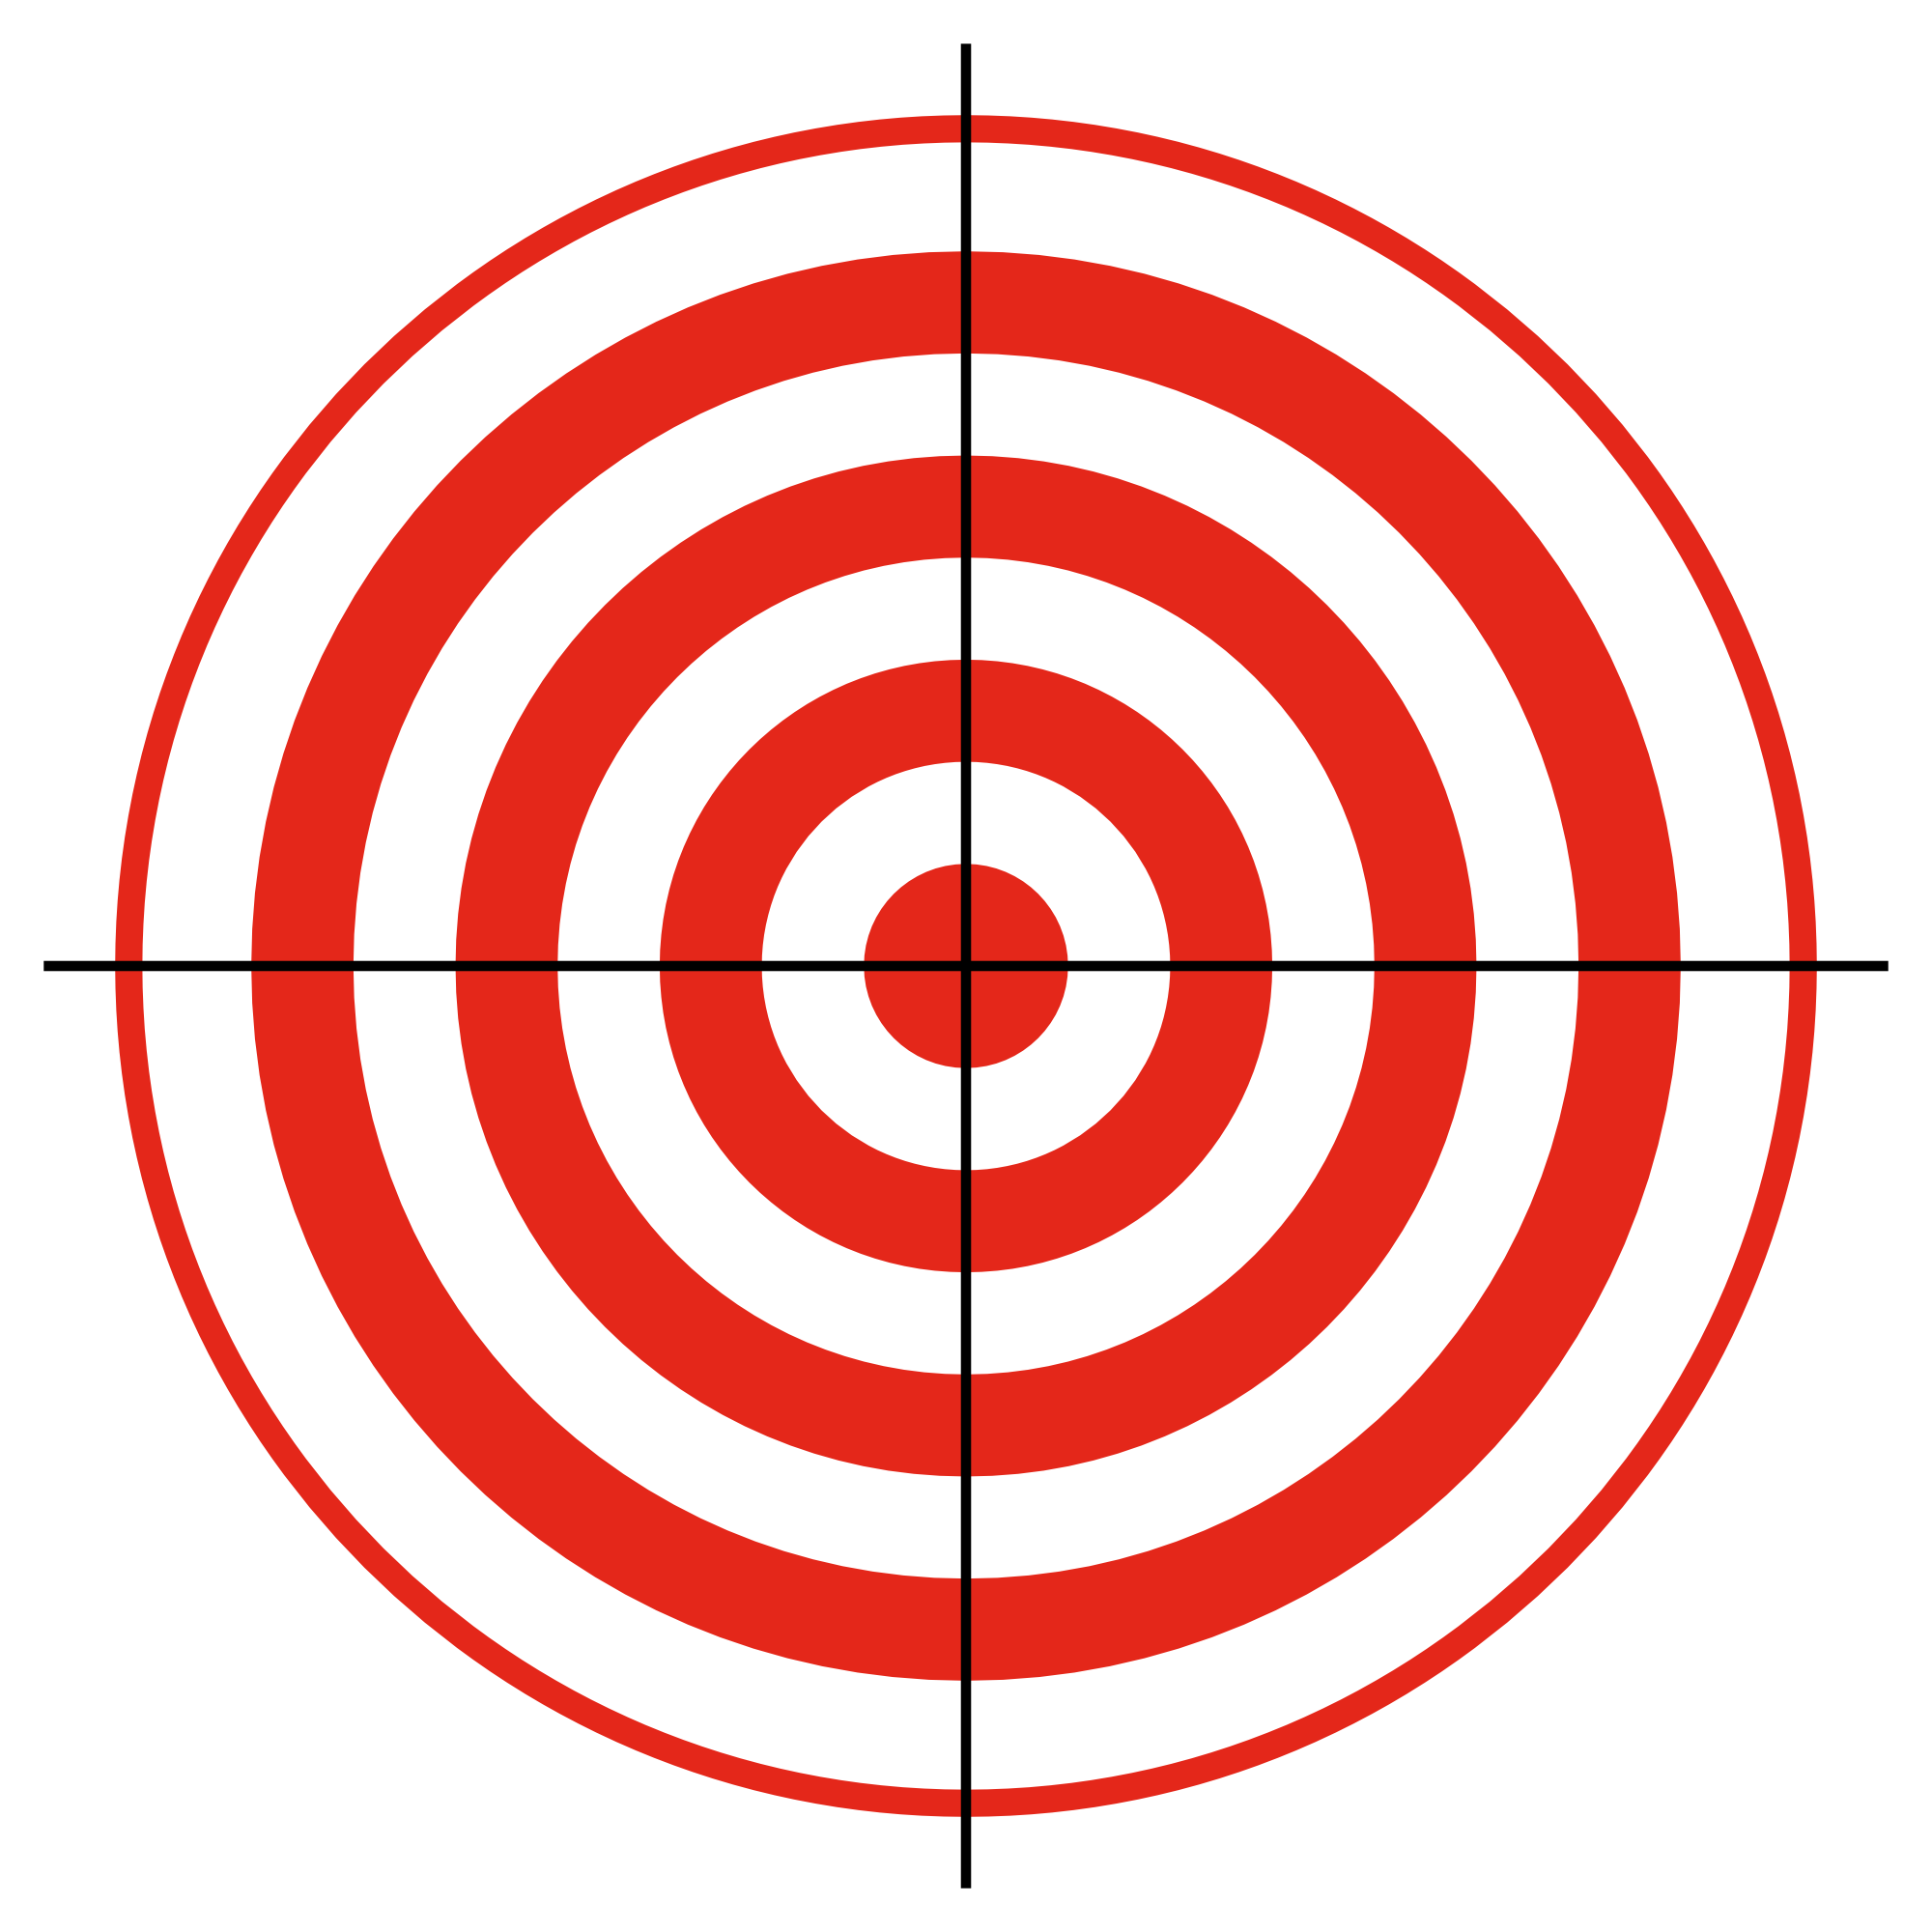 Target PNG - 2789